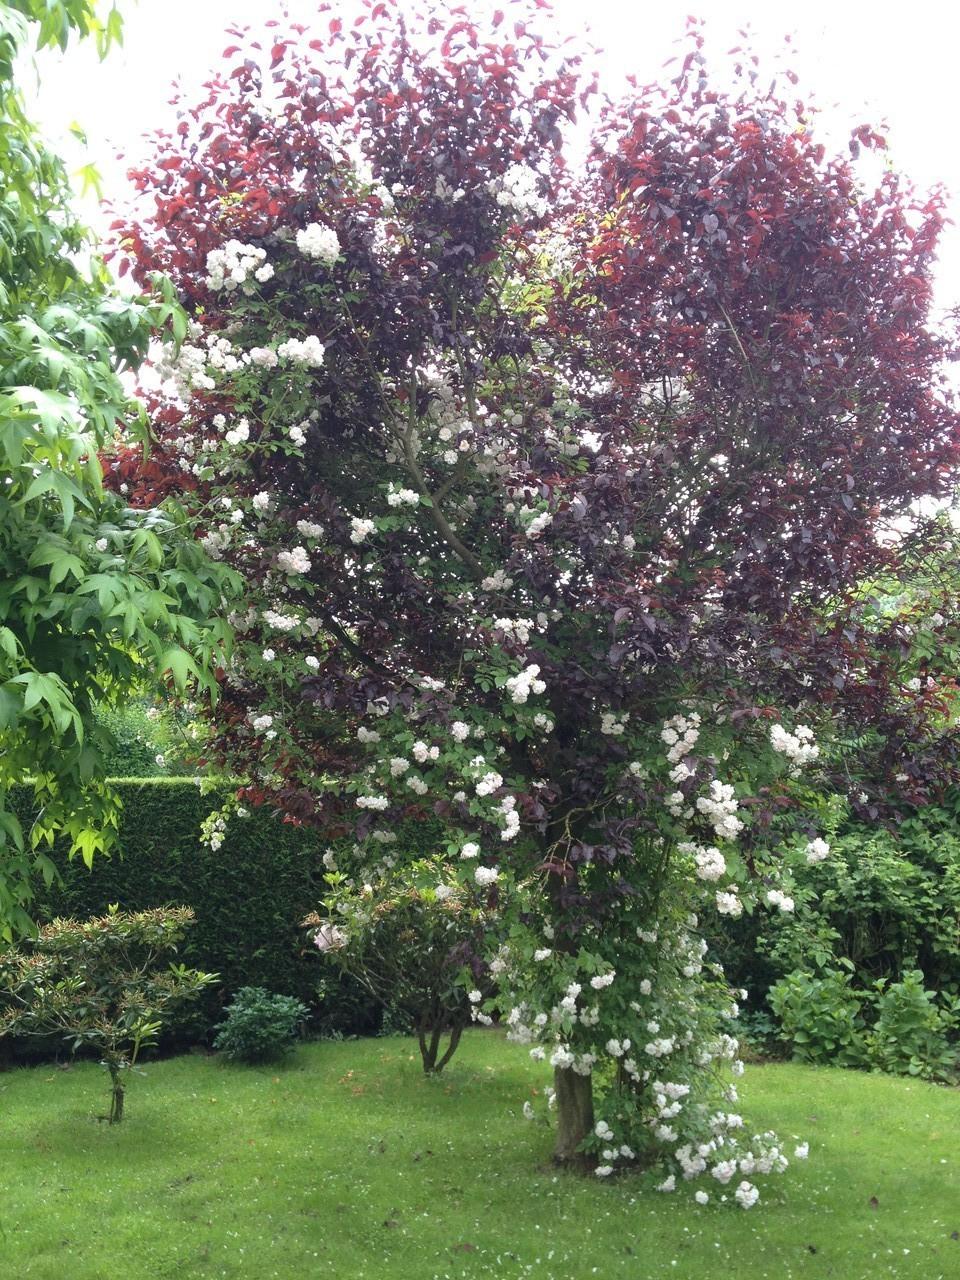 Paysagiste jardi proxi bondues entretien de jardins for Entretien jardin 93